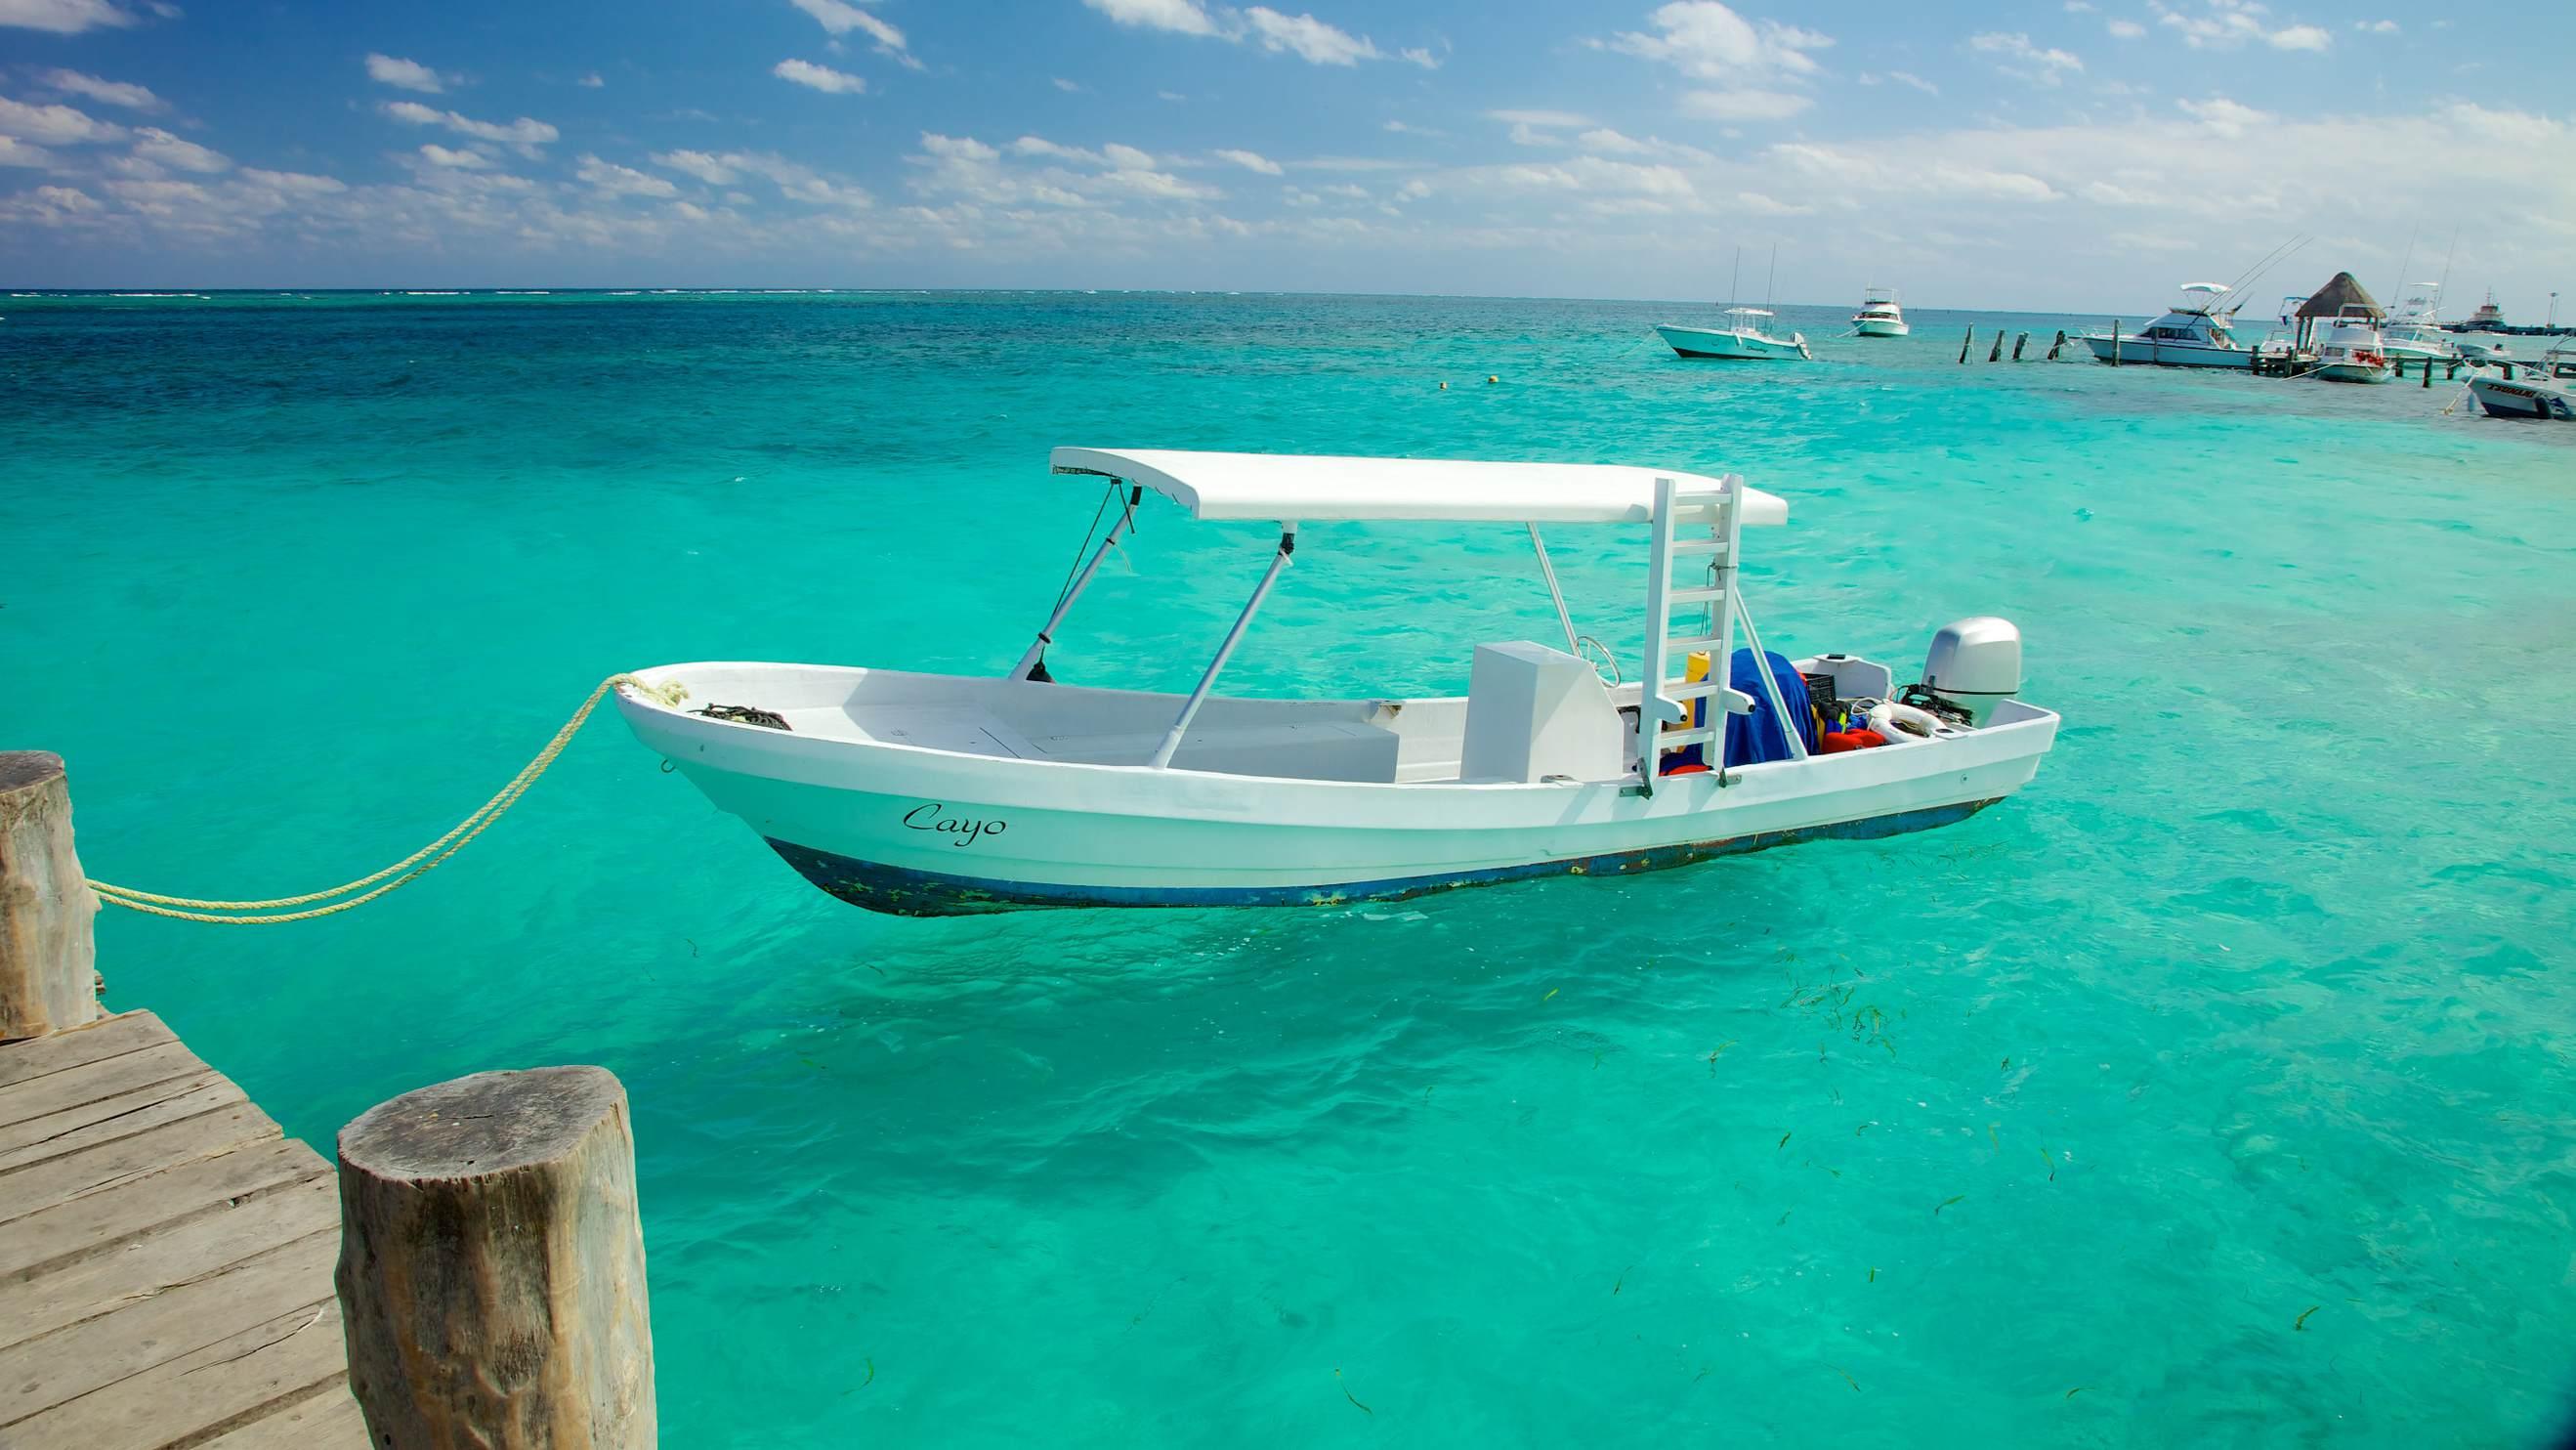 Riviera Maya Vacations 2019: Package & Save up to $583   Expedia